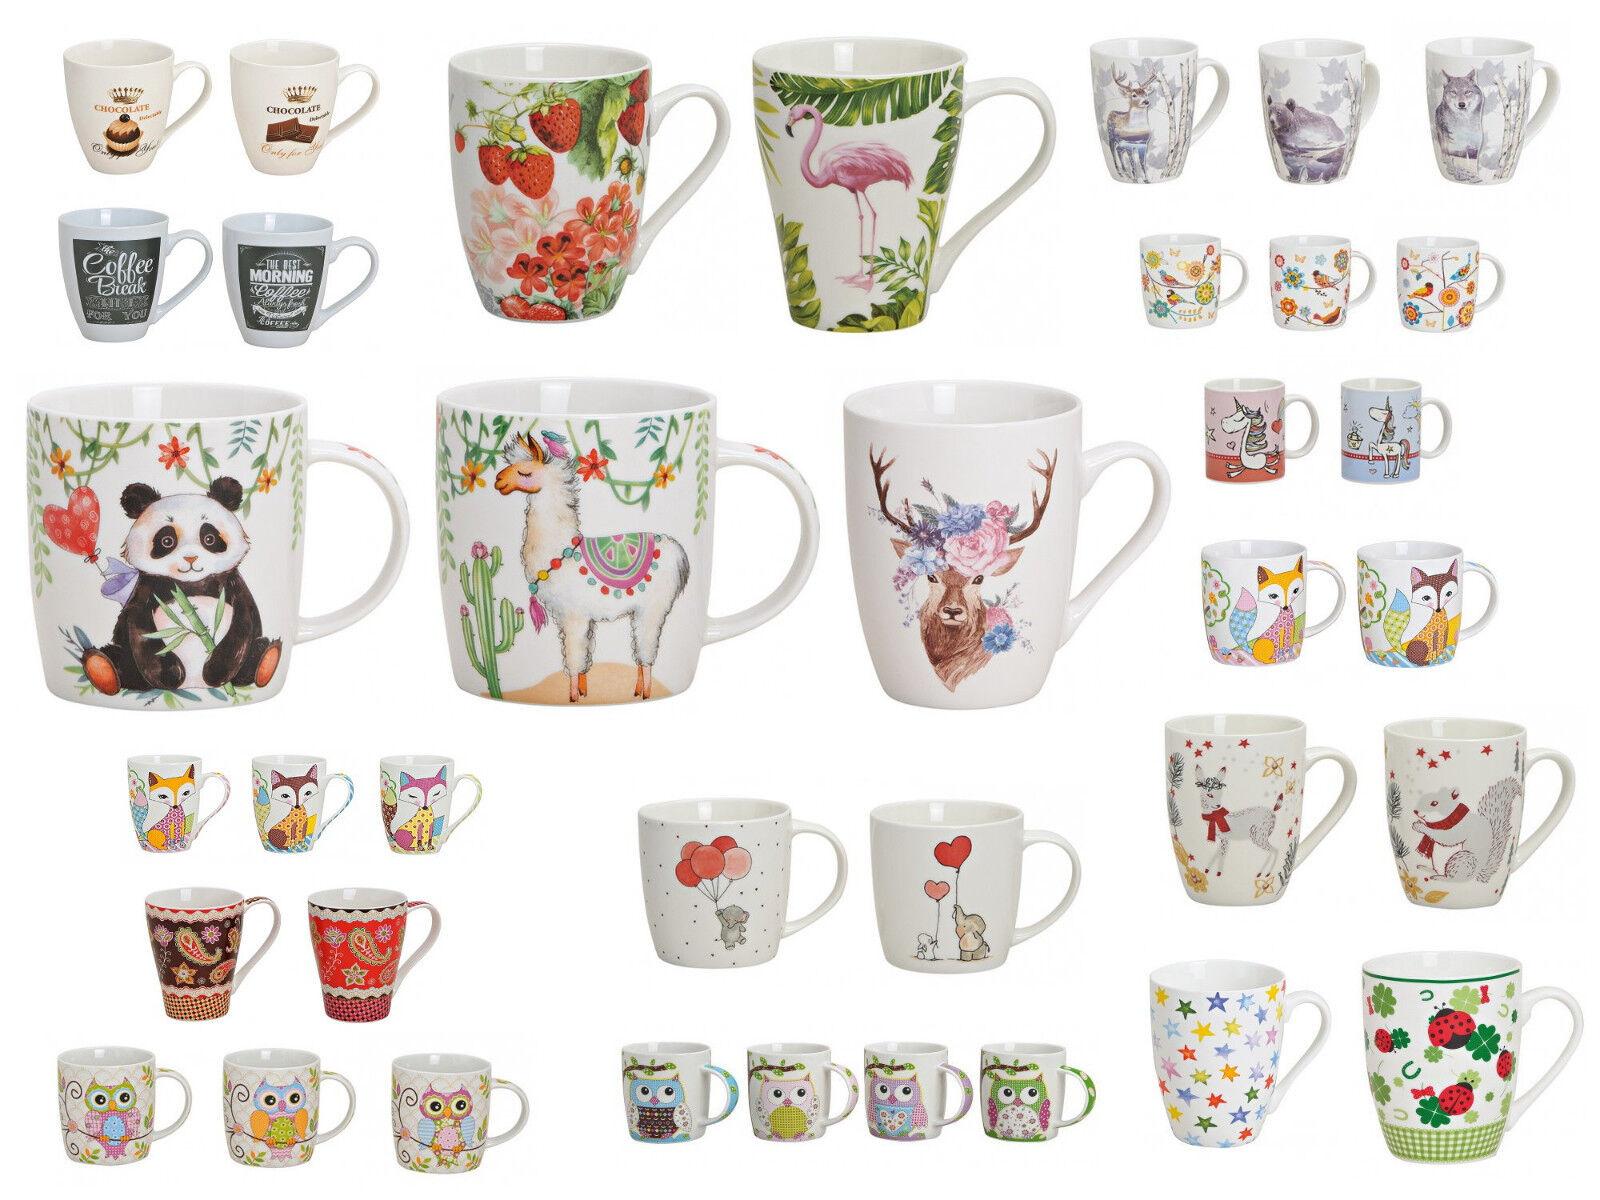 Tasse / Becher für Tee / Kaffee Porzellan reinschauen Motiv Auswahl